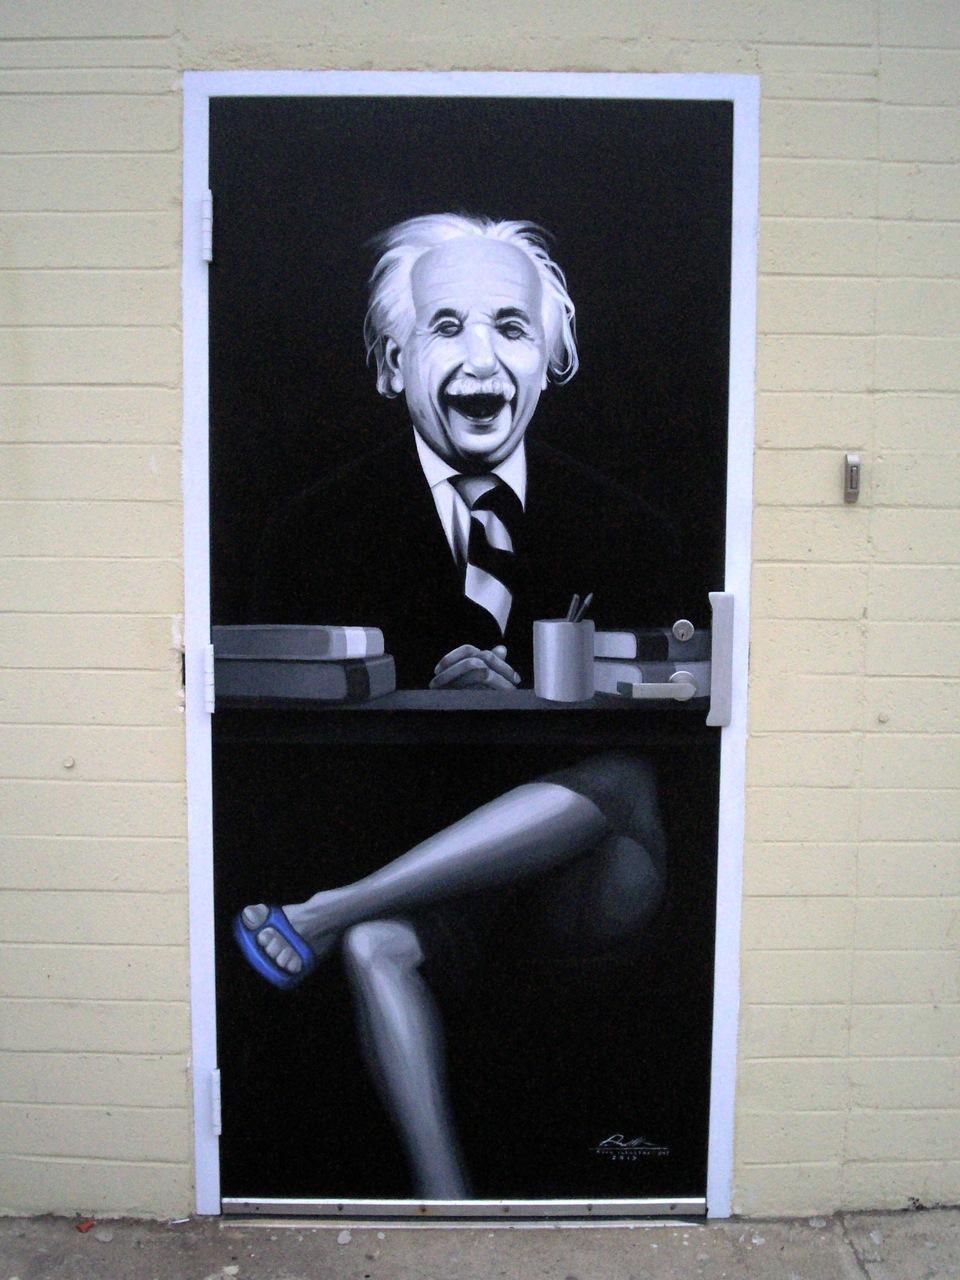 Einstein%20Laughing%20(door%20art)